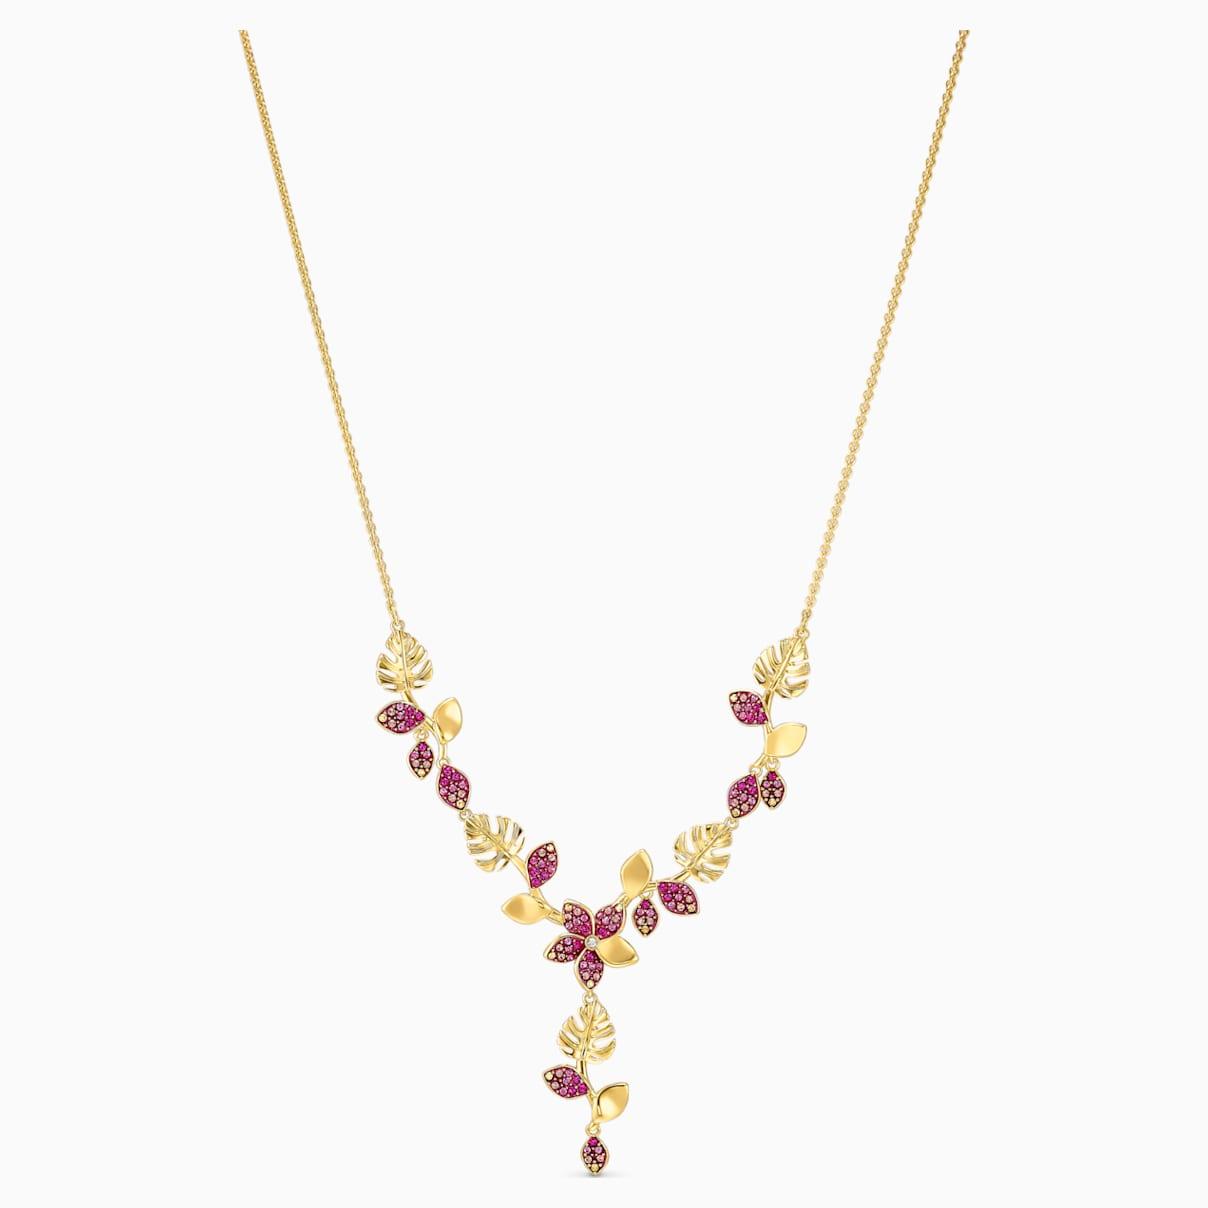 Collana a Y Tropical Flower, rosa, placcato color oro